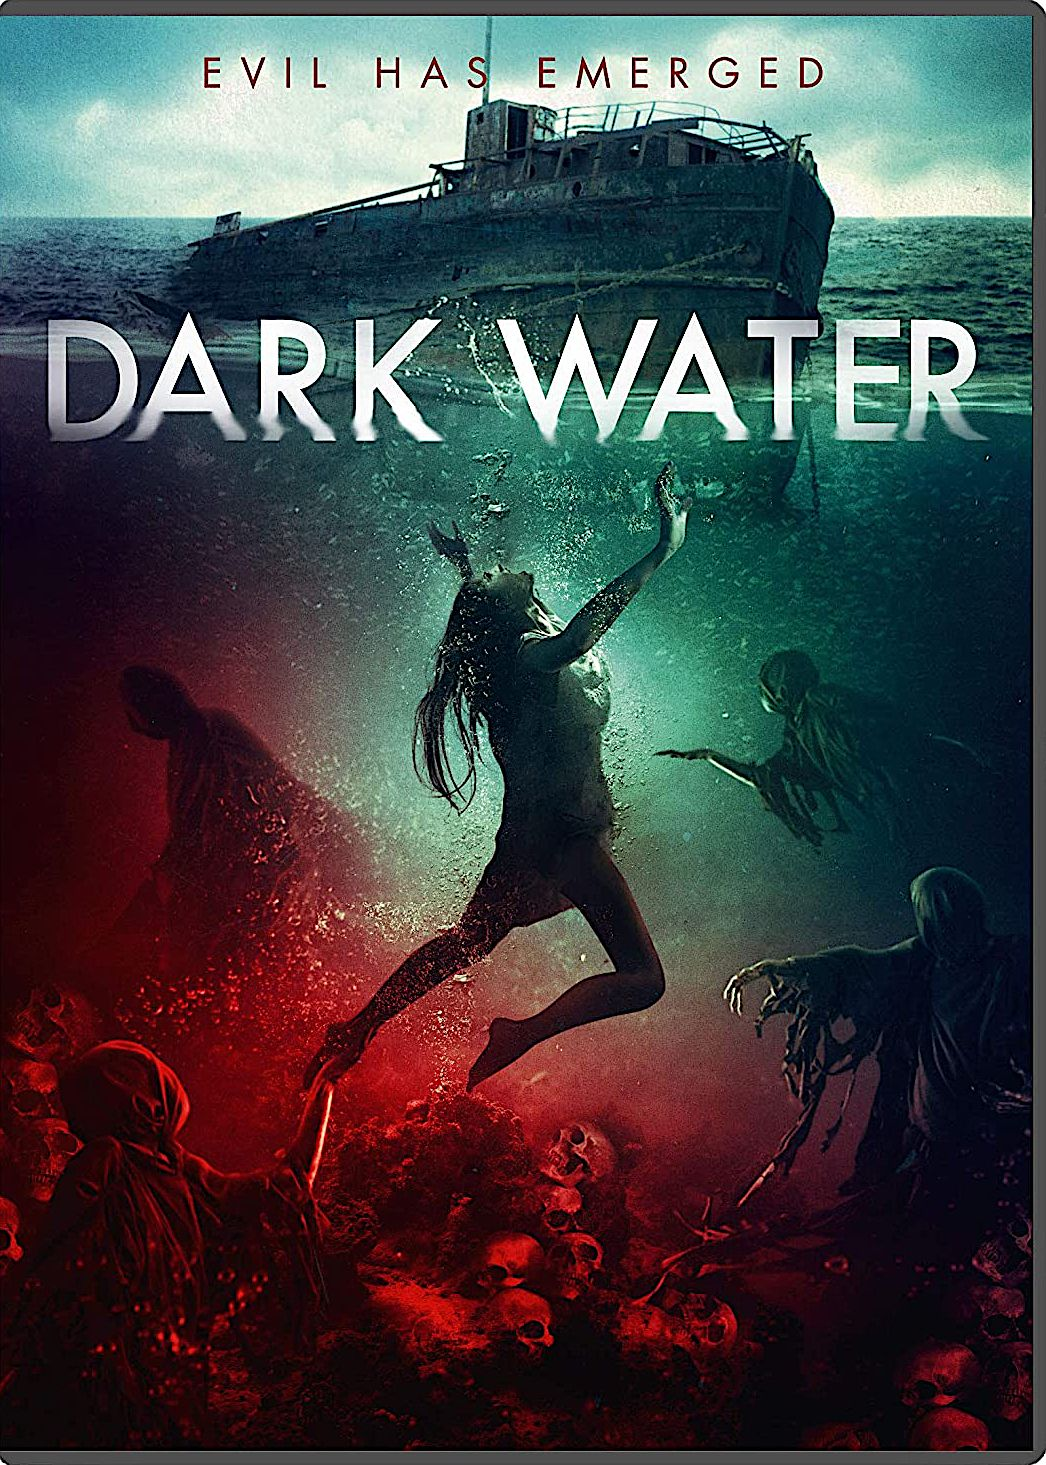 DARK WATER DVD (ITN) in 2020 Horror, Dark, Poster